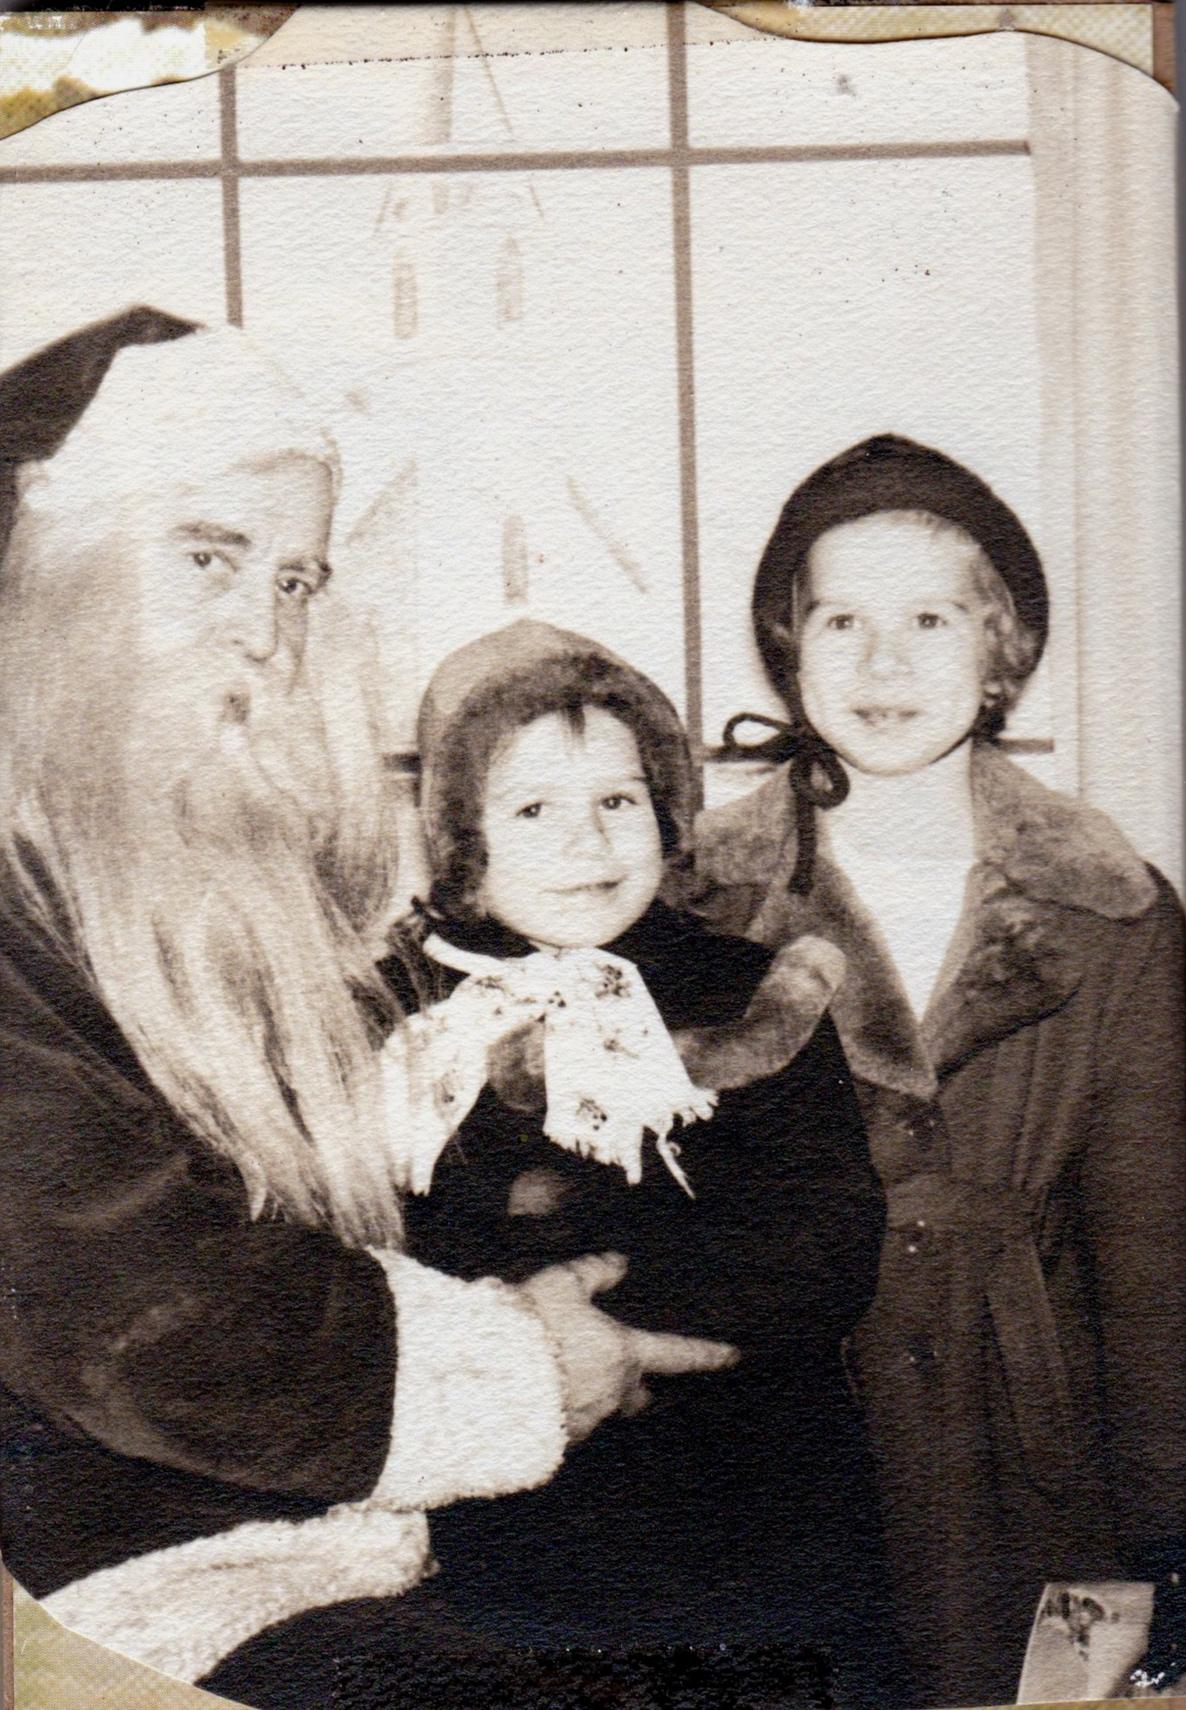 Lin+and+Diane+with+Santa.jpg